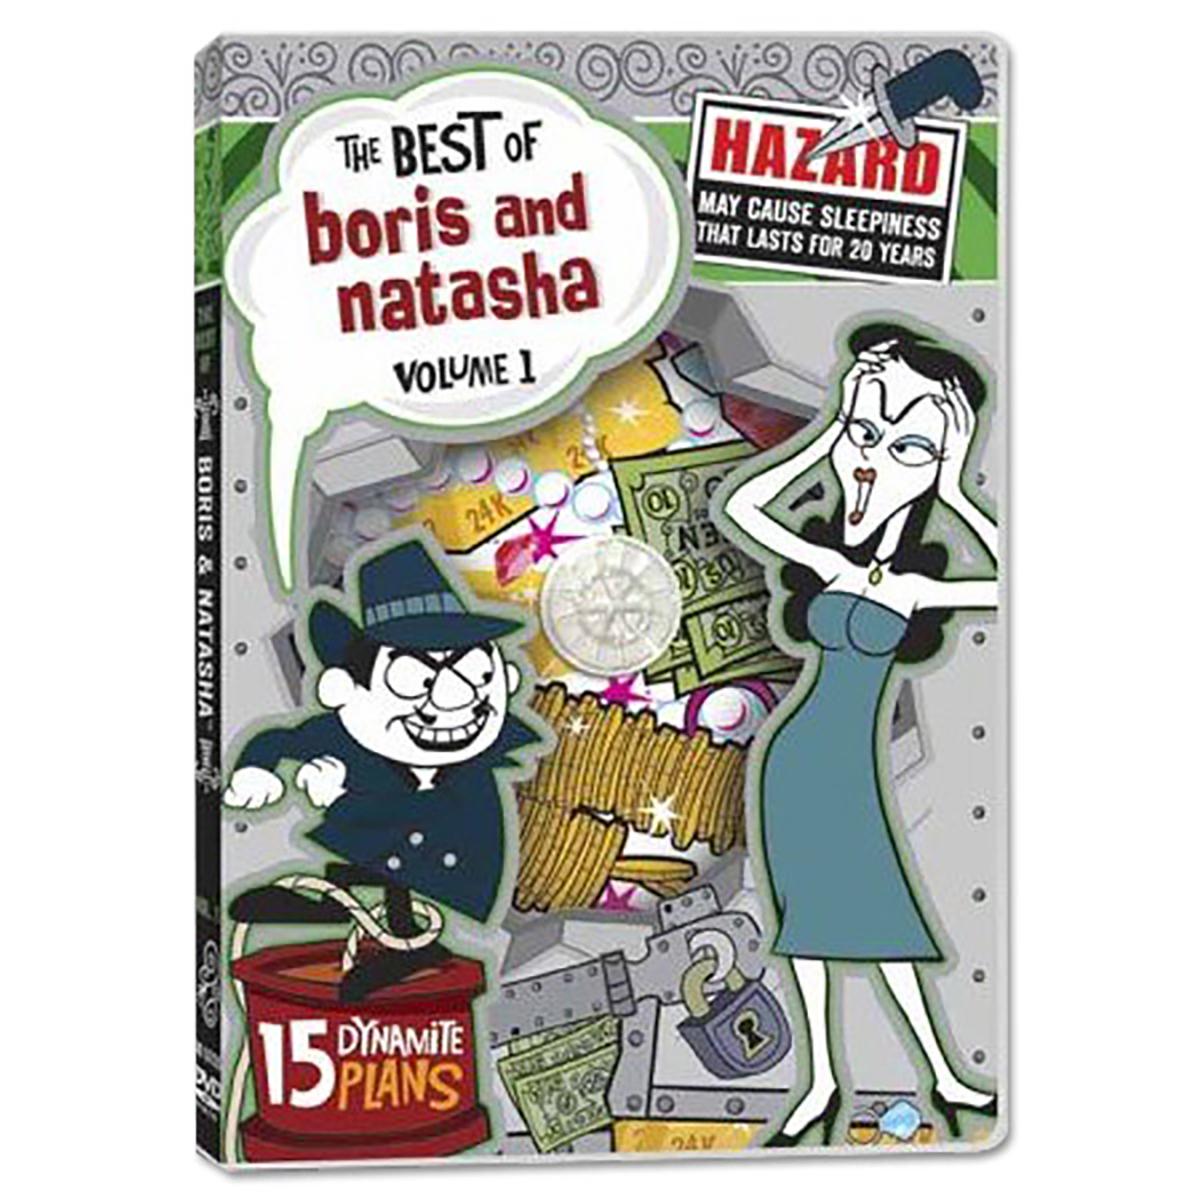 The Best Of Boris & Natasha Vol. 1 DVD